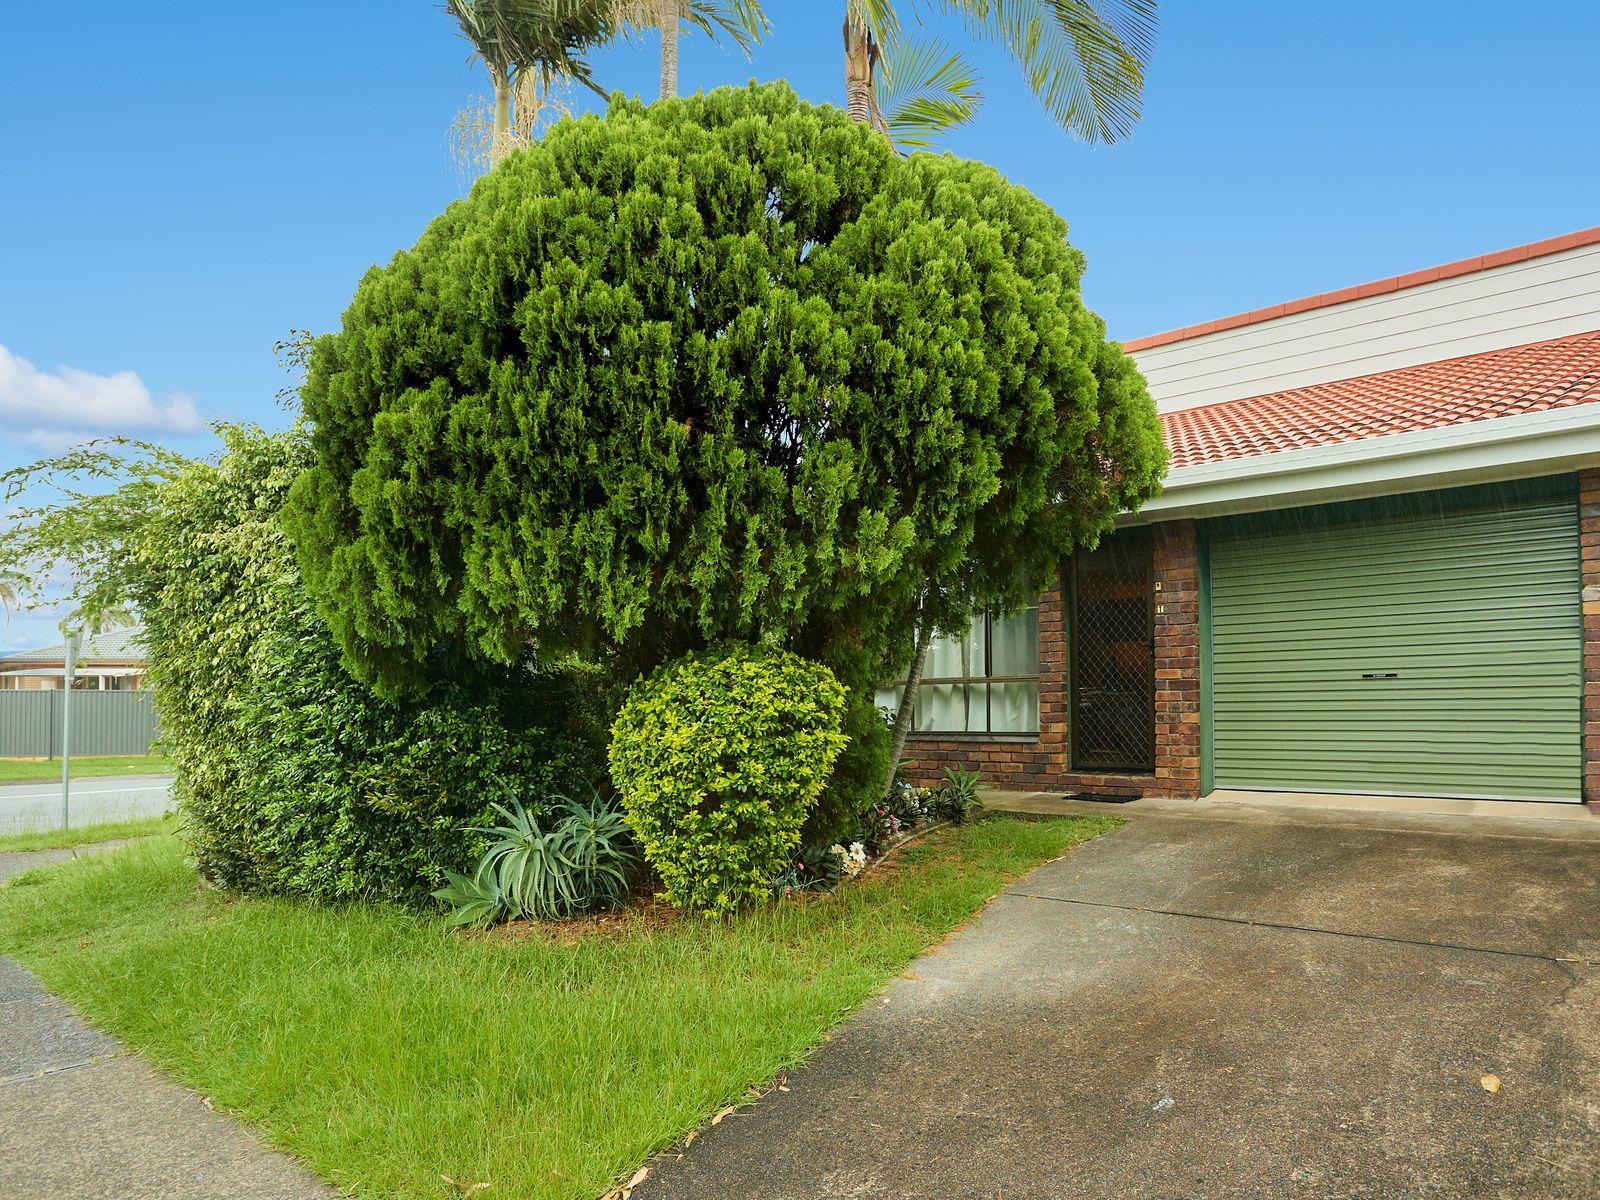 1/111 Sunshine Boulevard, Mermaid Waters, QLD 4218